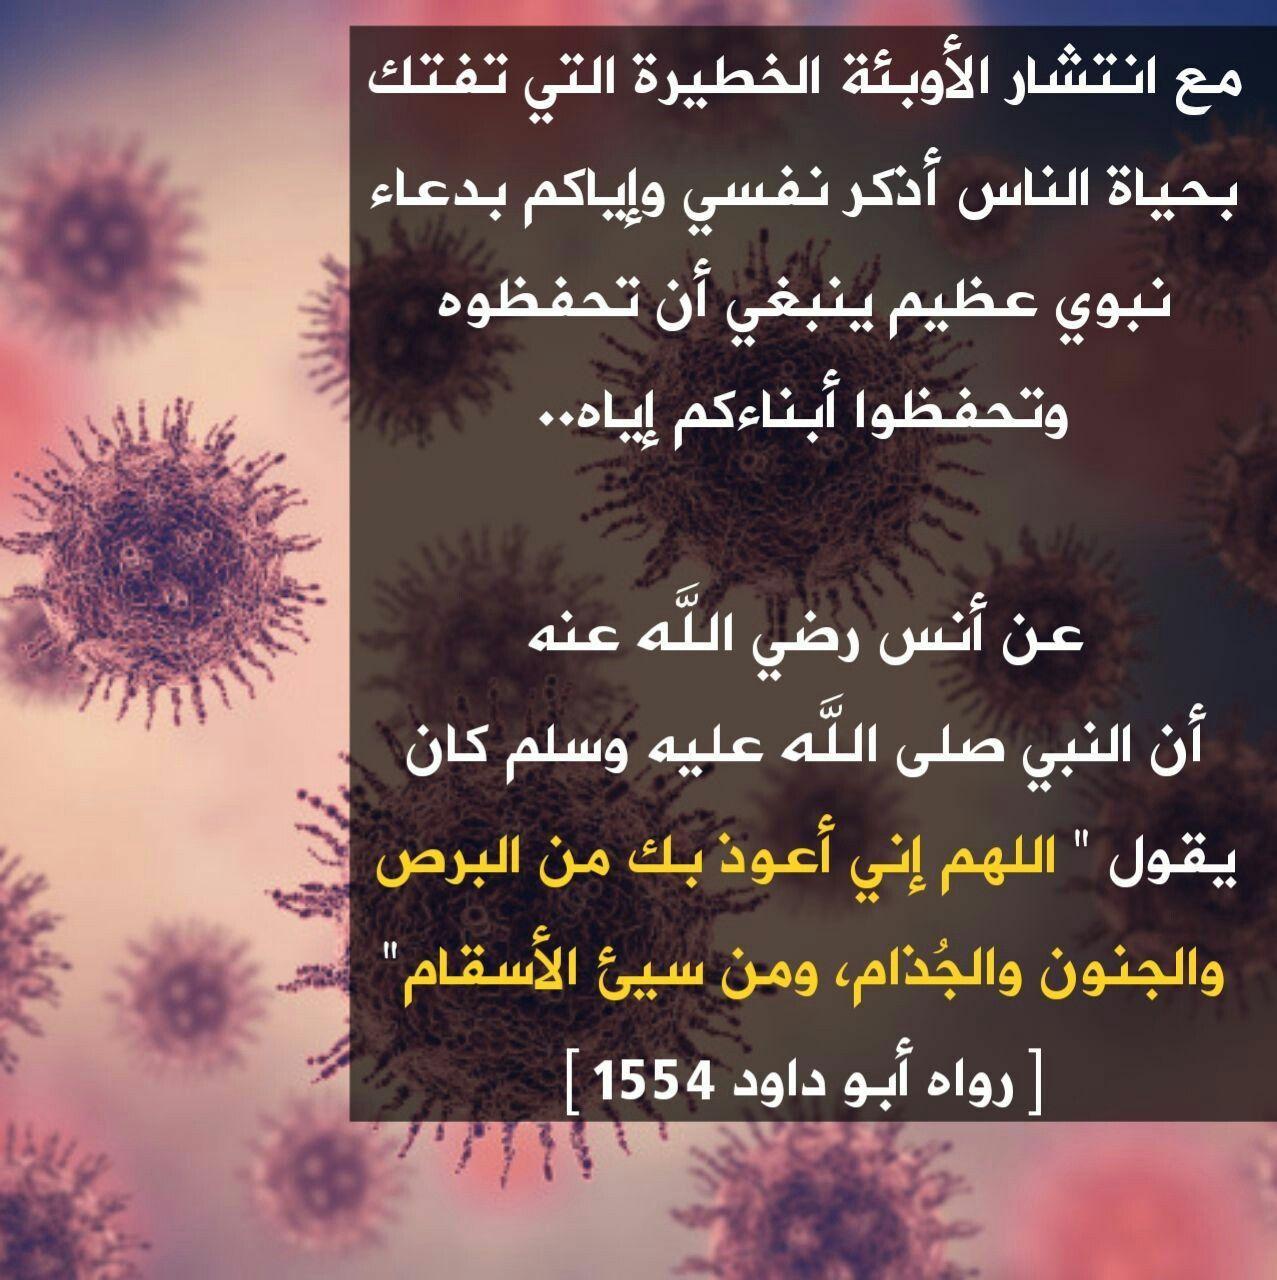 Pin By زهرة الياسمين On دعاء Duaa Flowers Poster Plants